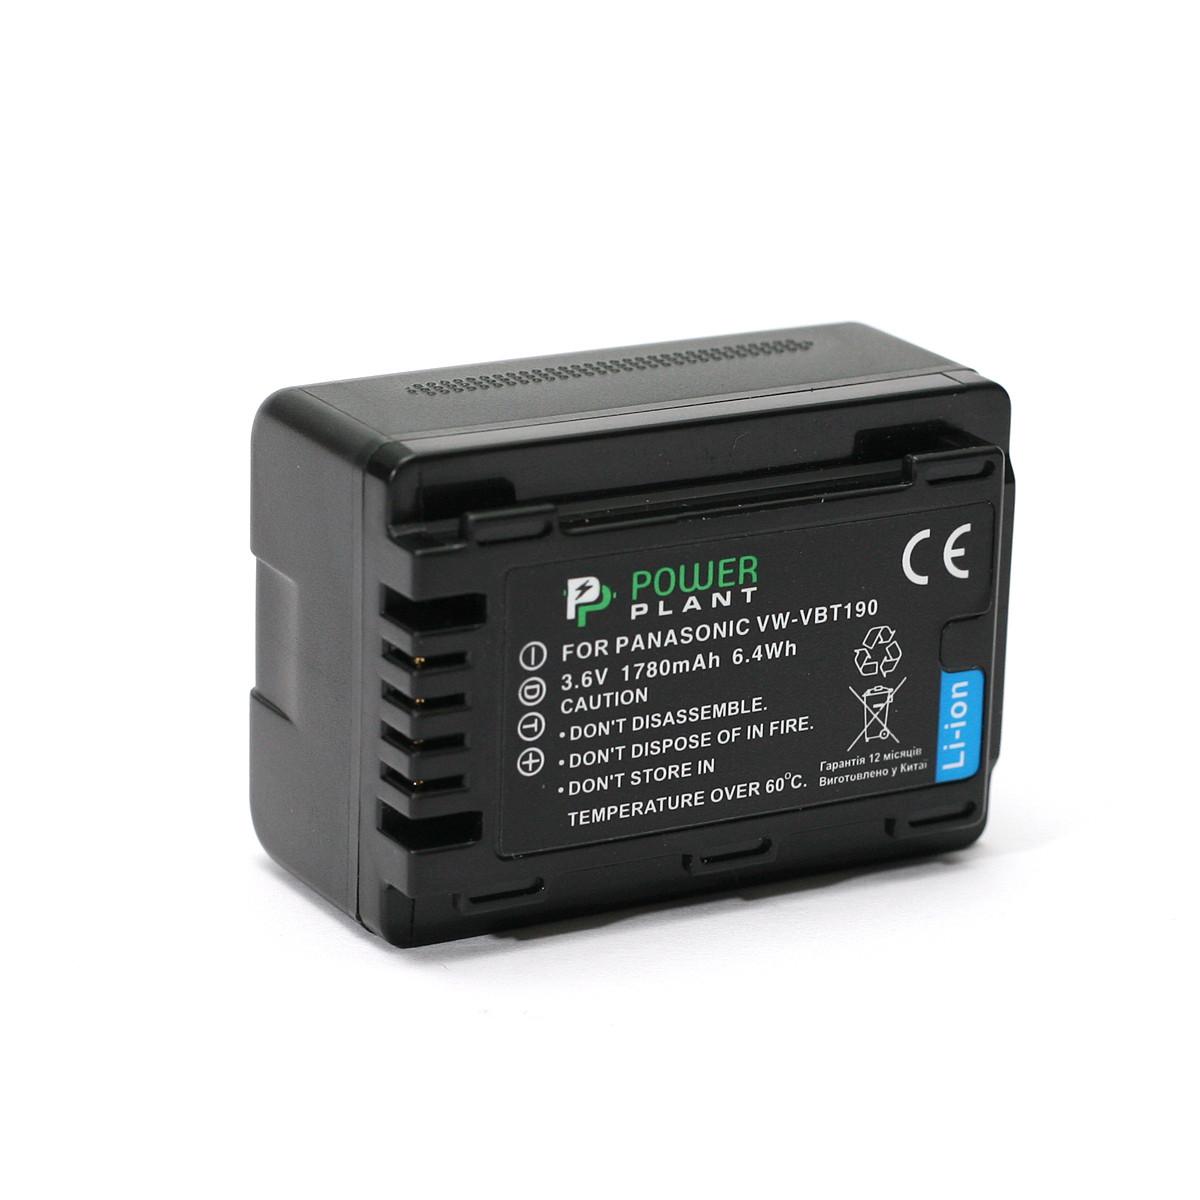 Аккумулятор PowerPlant Panasonic VW-VBT190 1780mAh